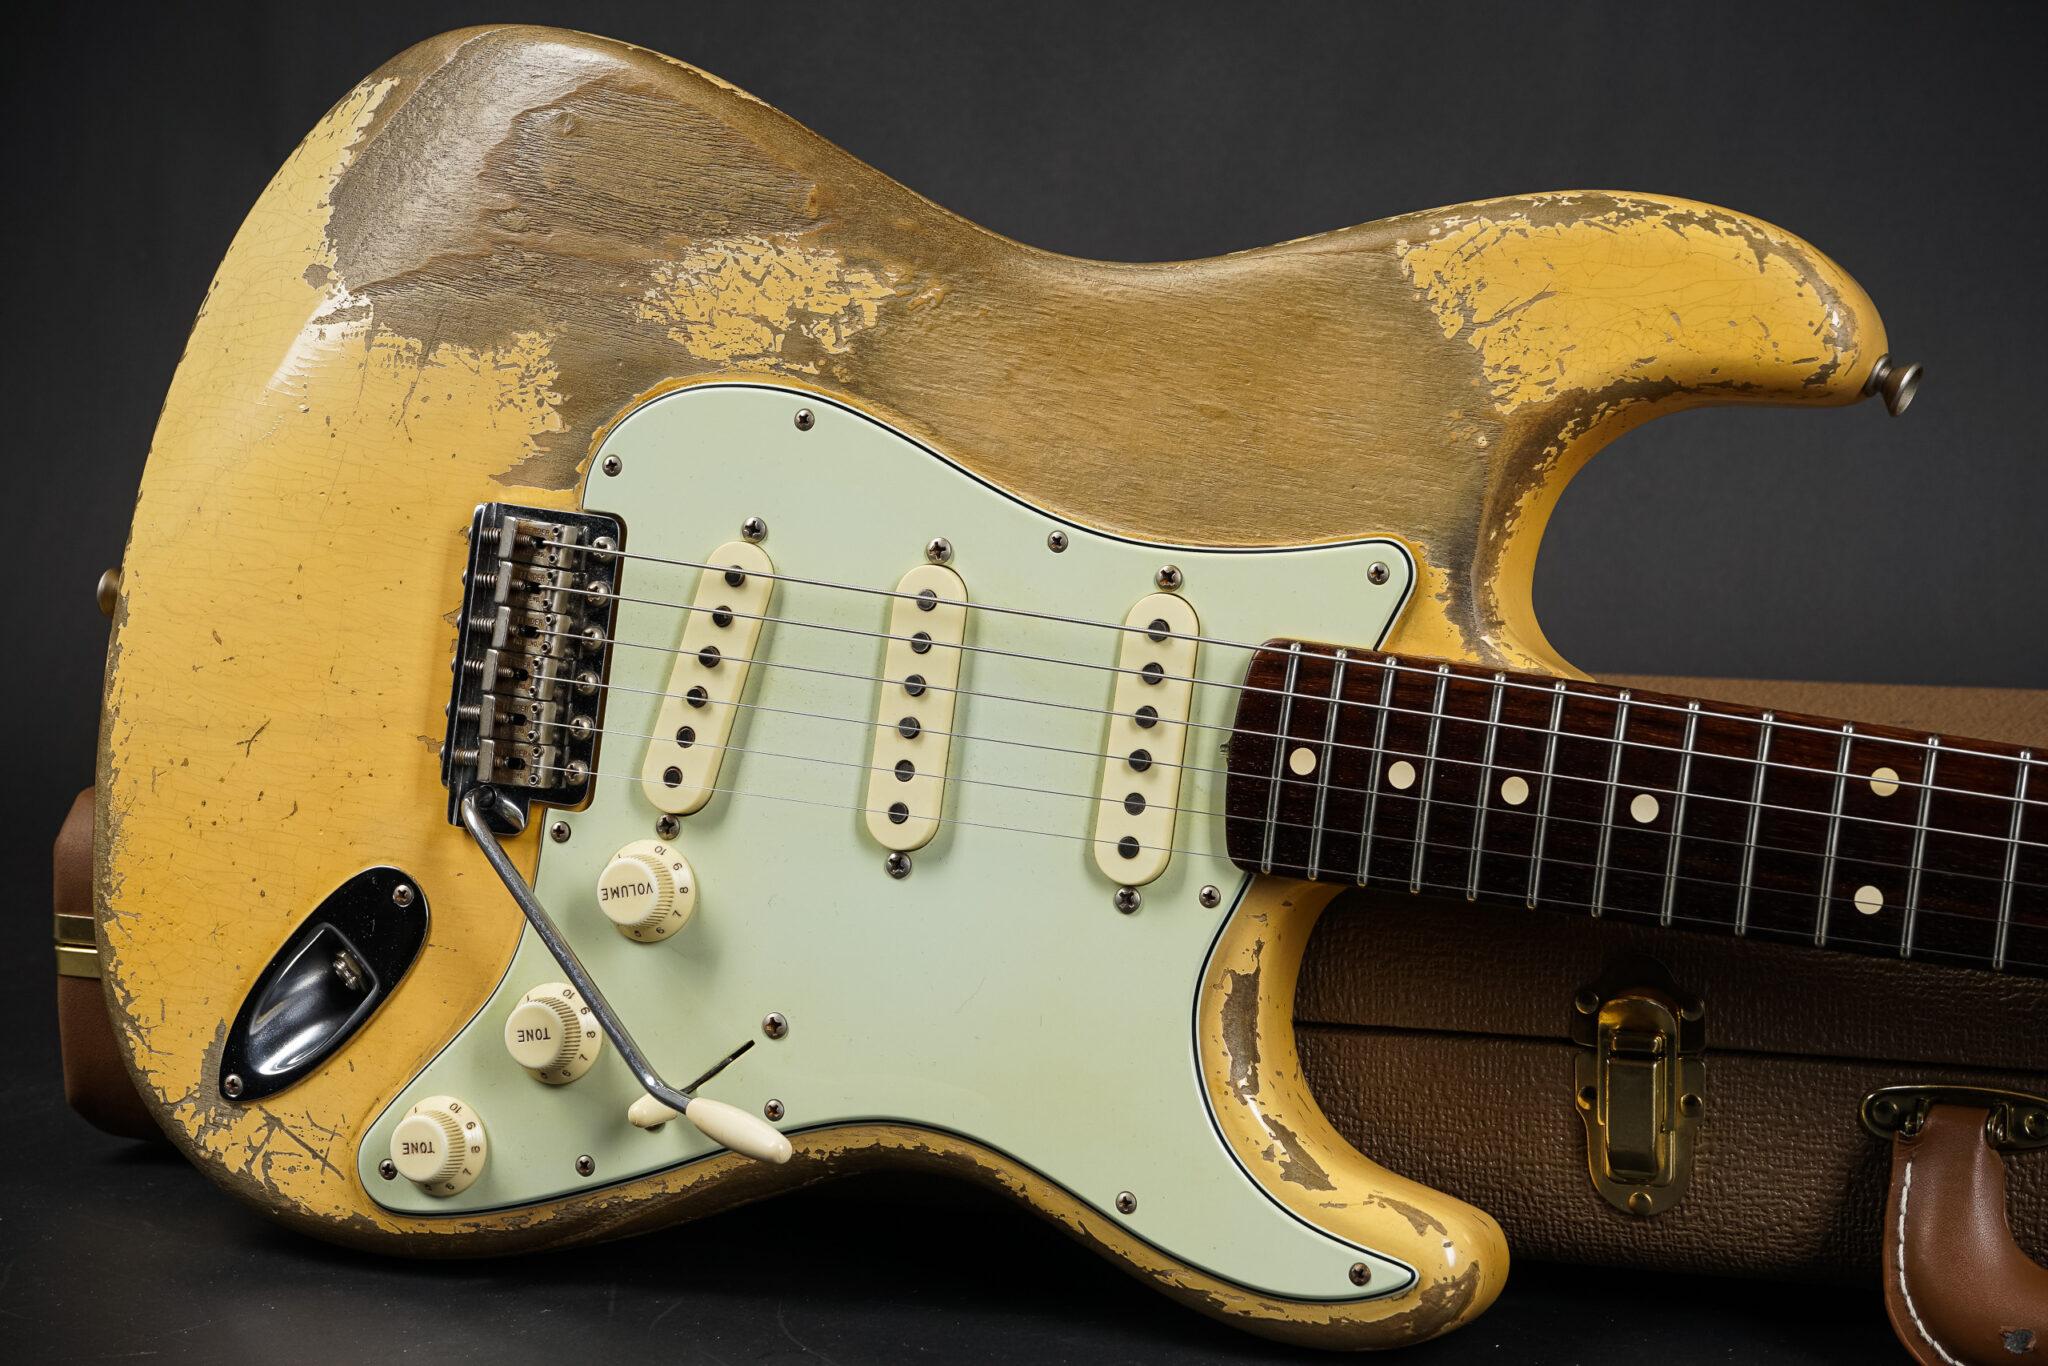 https://guitarpoint.de/app/uploads/products/2018-fender-dale-wilson-masterbuilt-1960-stratocaster-heavy-relic-vintage-blond-298kg/2018-Fender-MBDW-Dale-Wilson-1960-Strat-Heavy-Relic-Vintage-Blonde-9-2048x1366.jpg